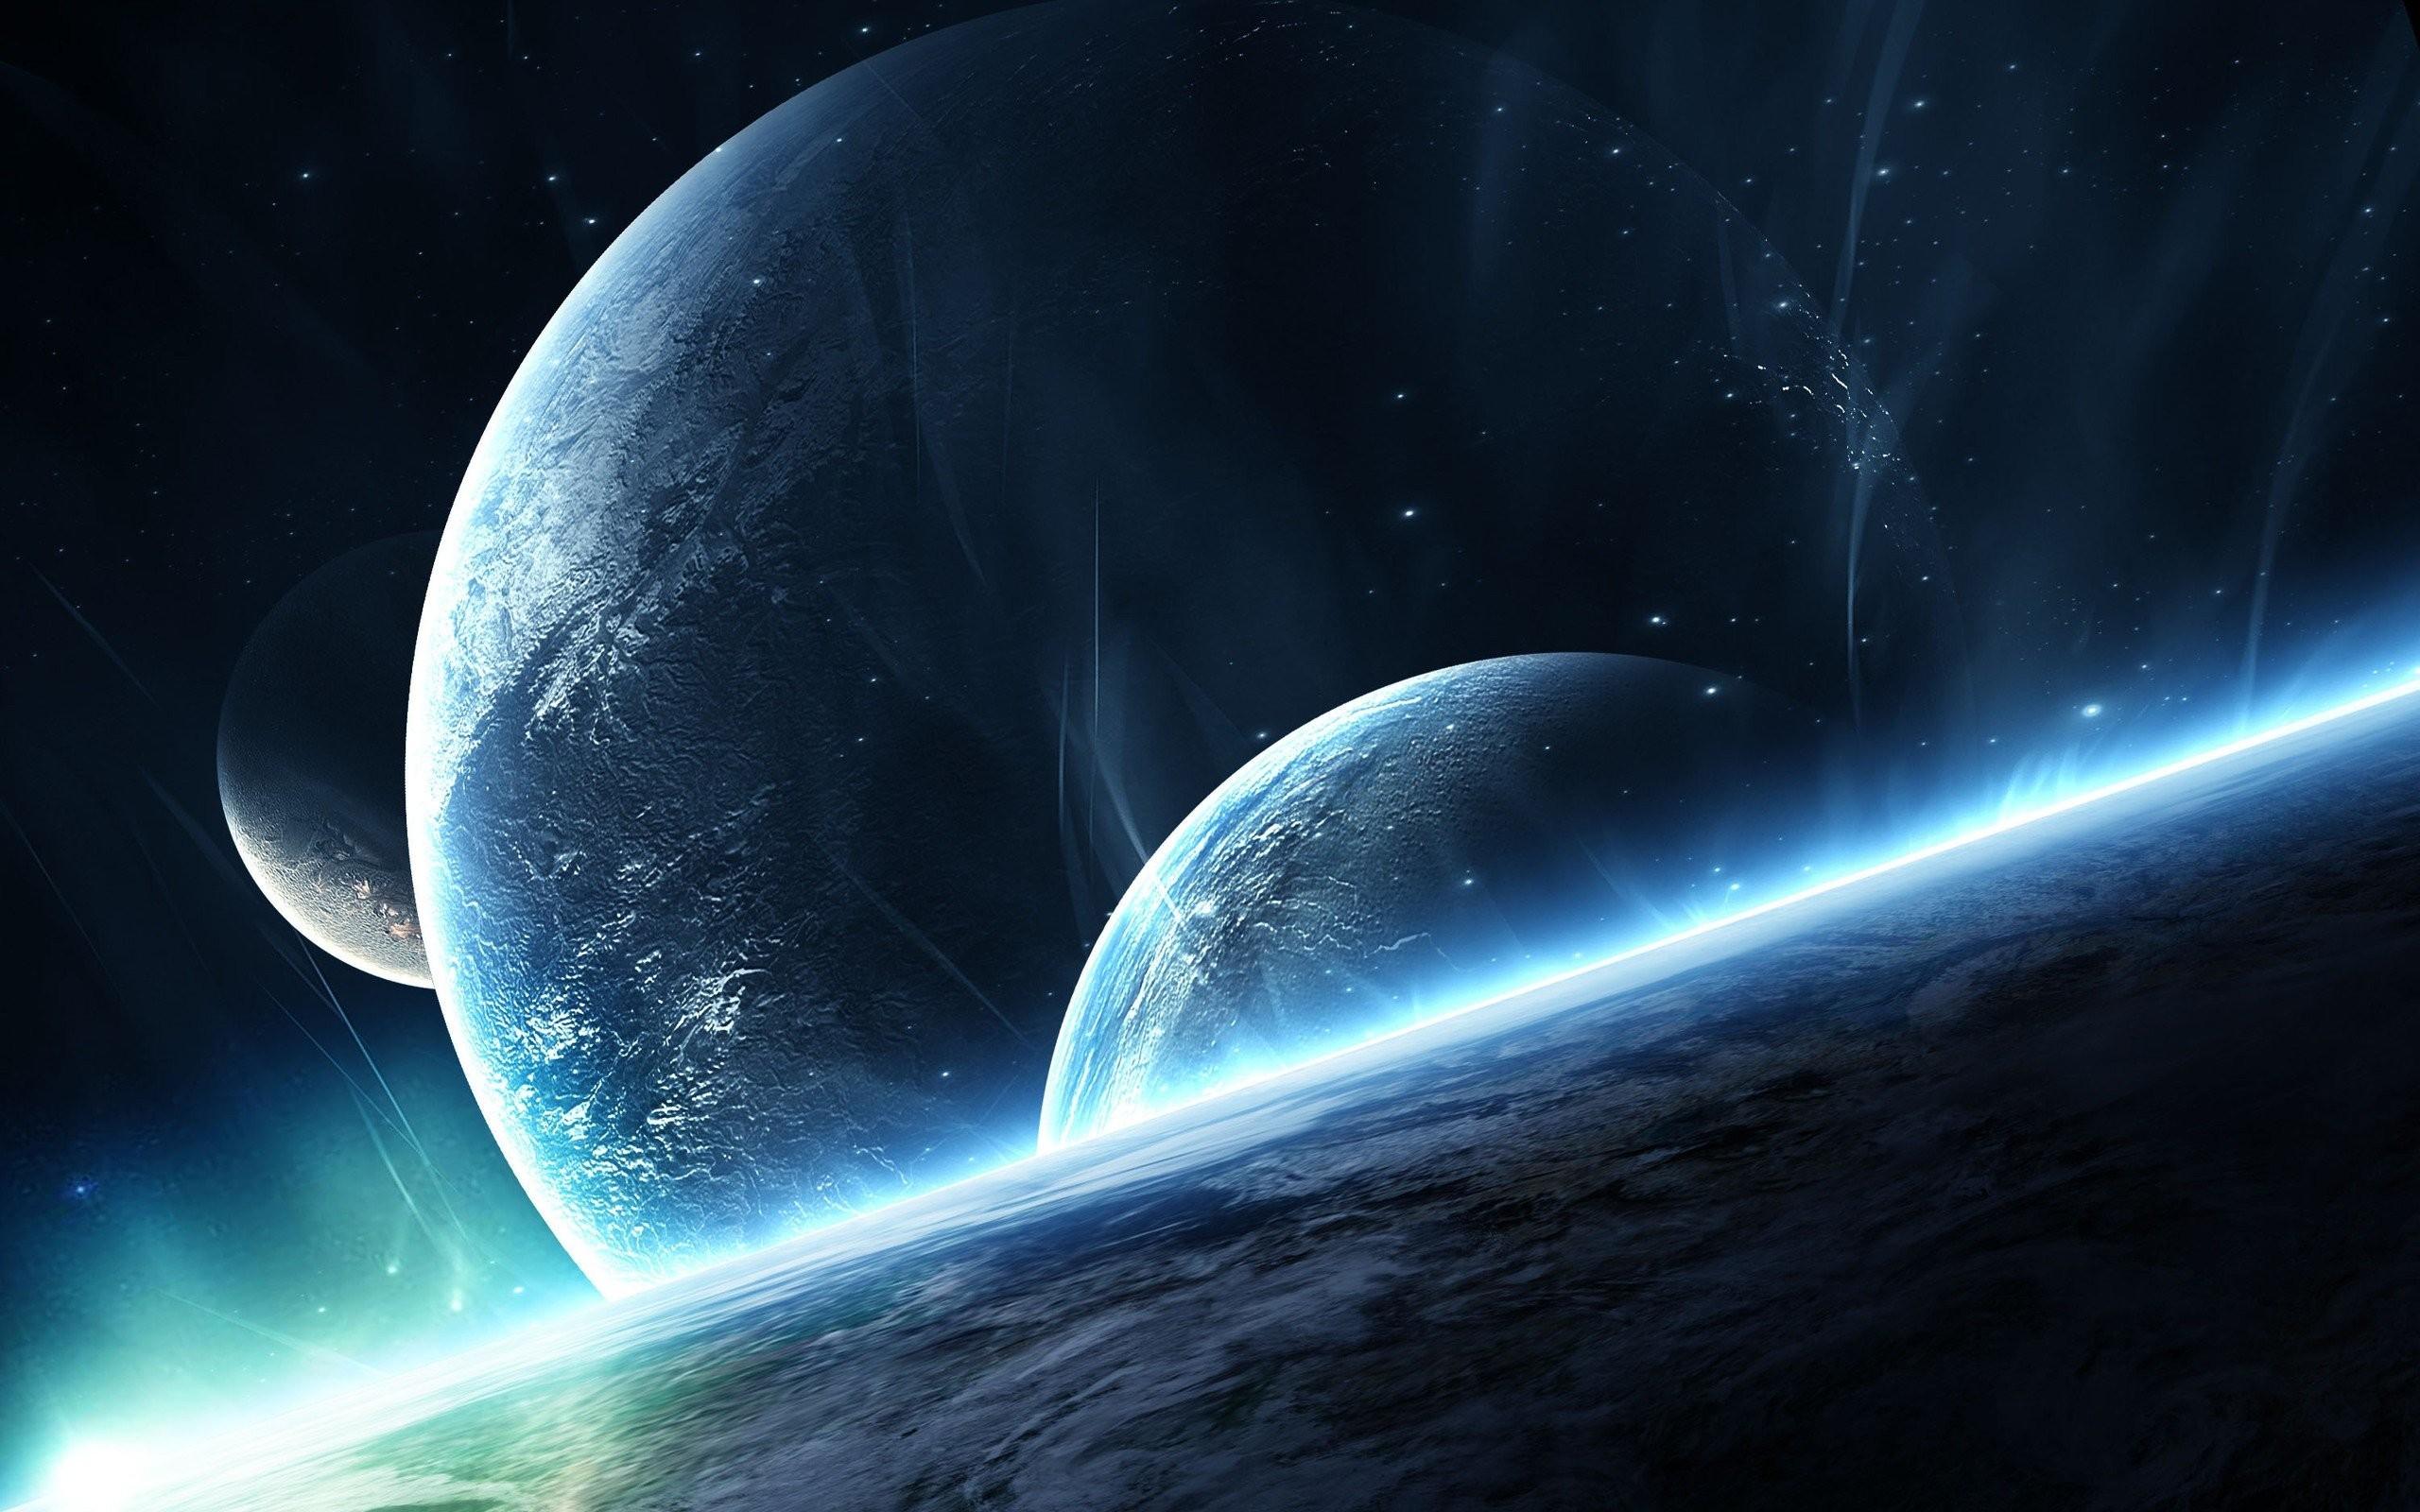 … space wallpaper 5 …